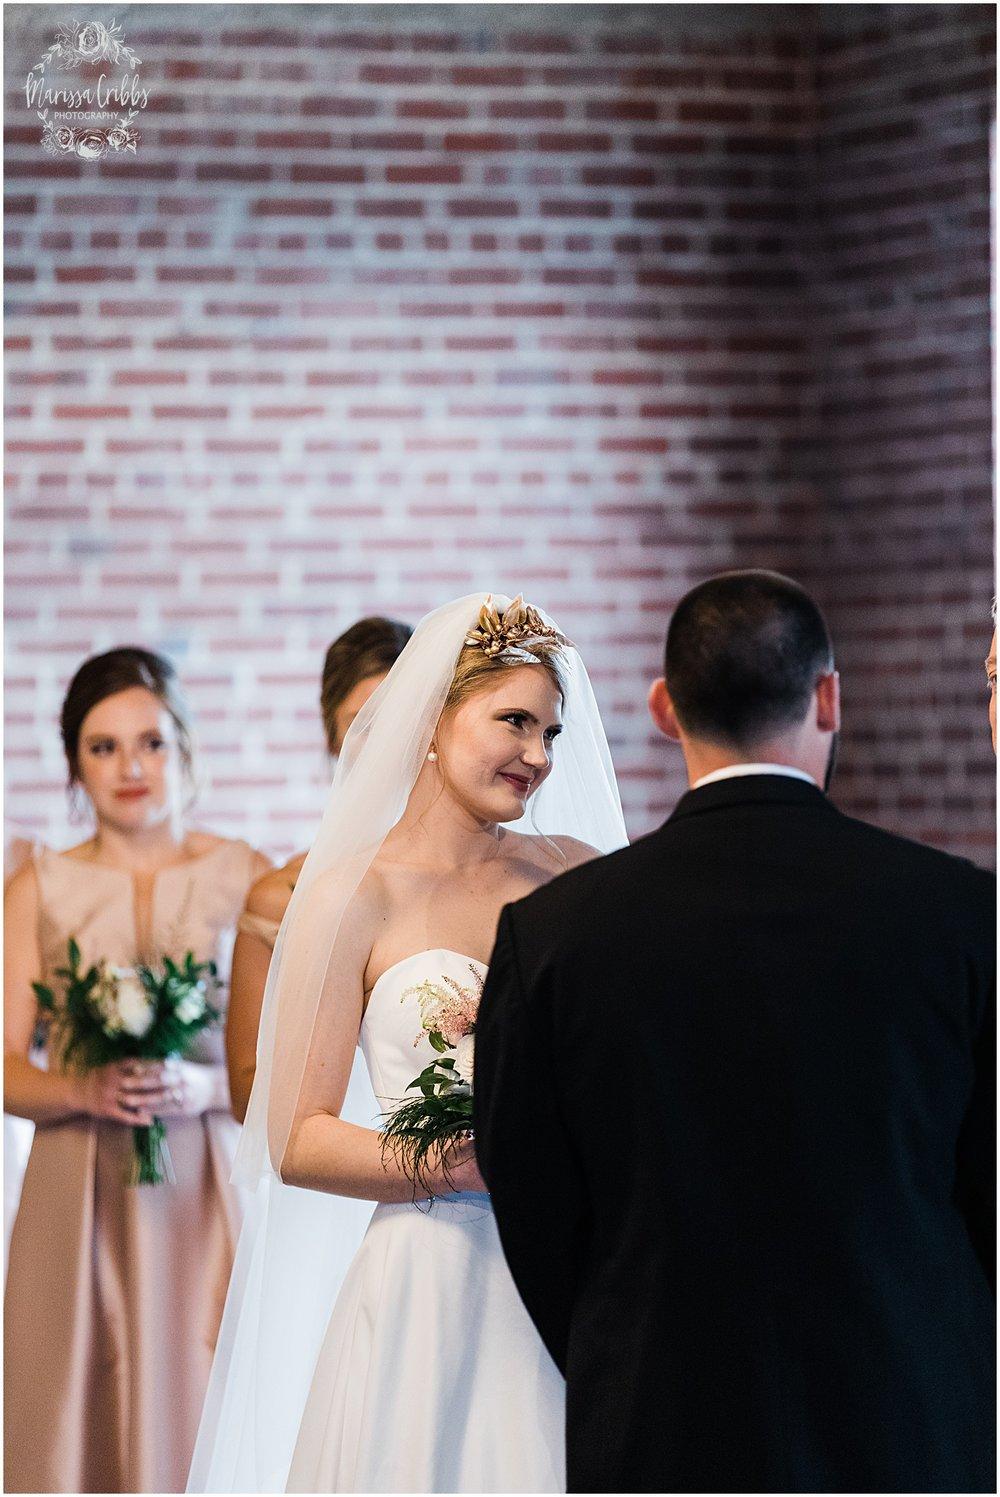 ABBY & CHARLIE WEDDING   THE HUDSON EVENT SPACE WEDDING   MARISSA CRIBBS PHOTOGRAPHY_7552.jpg